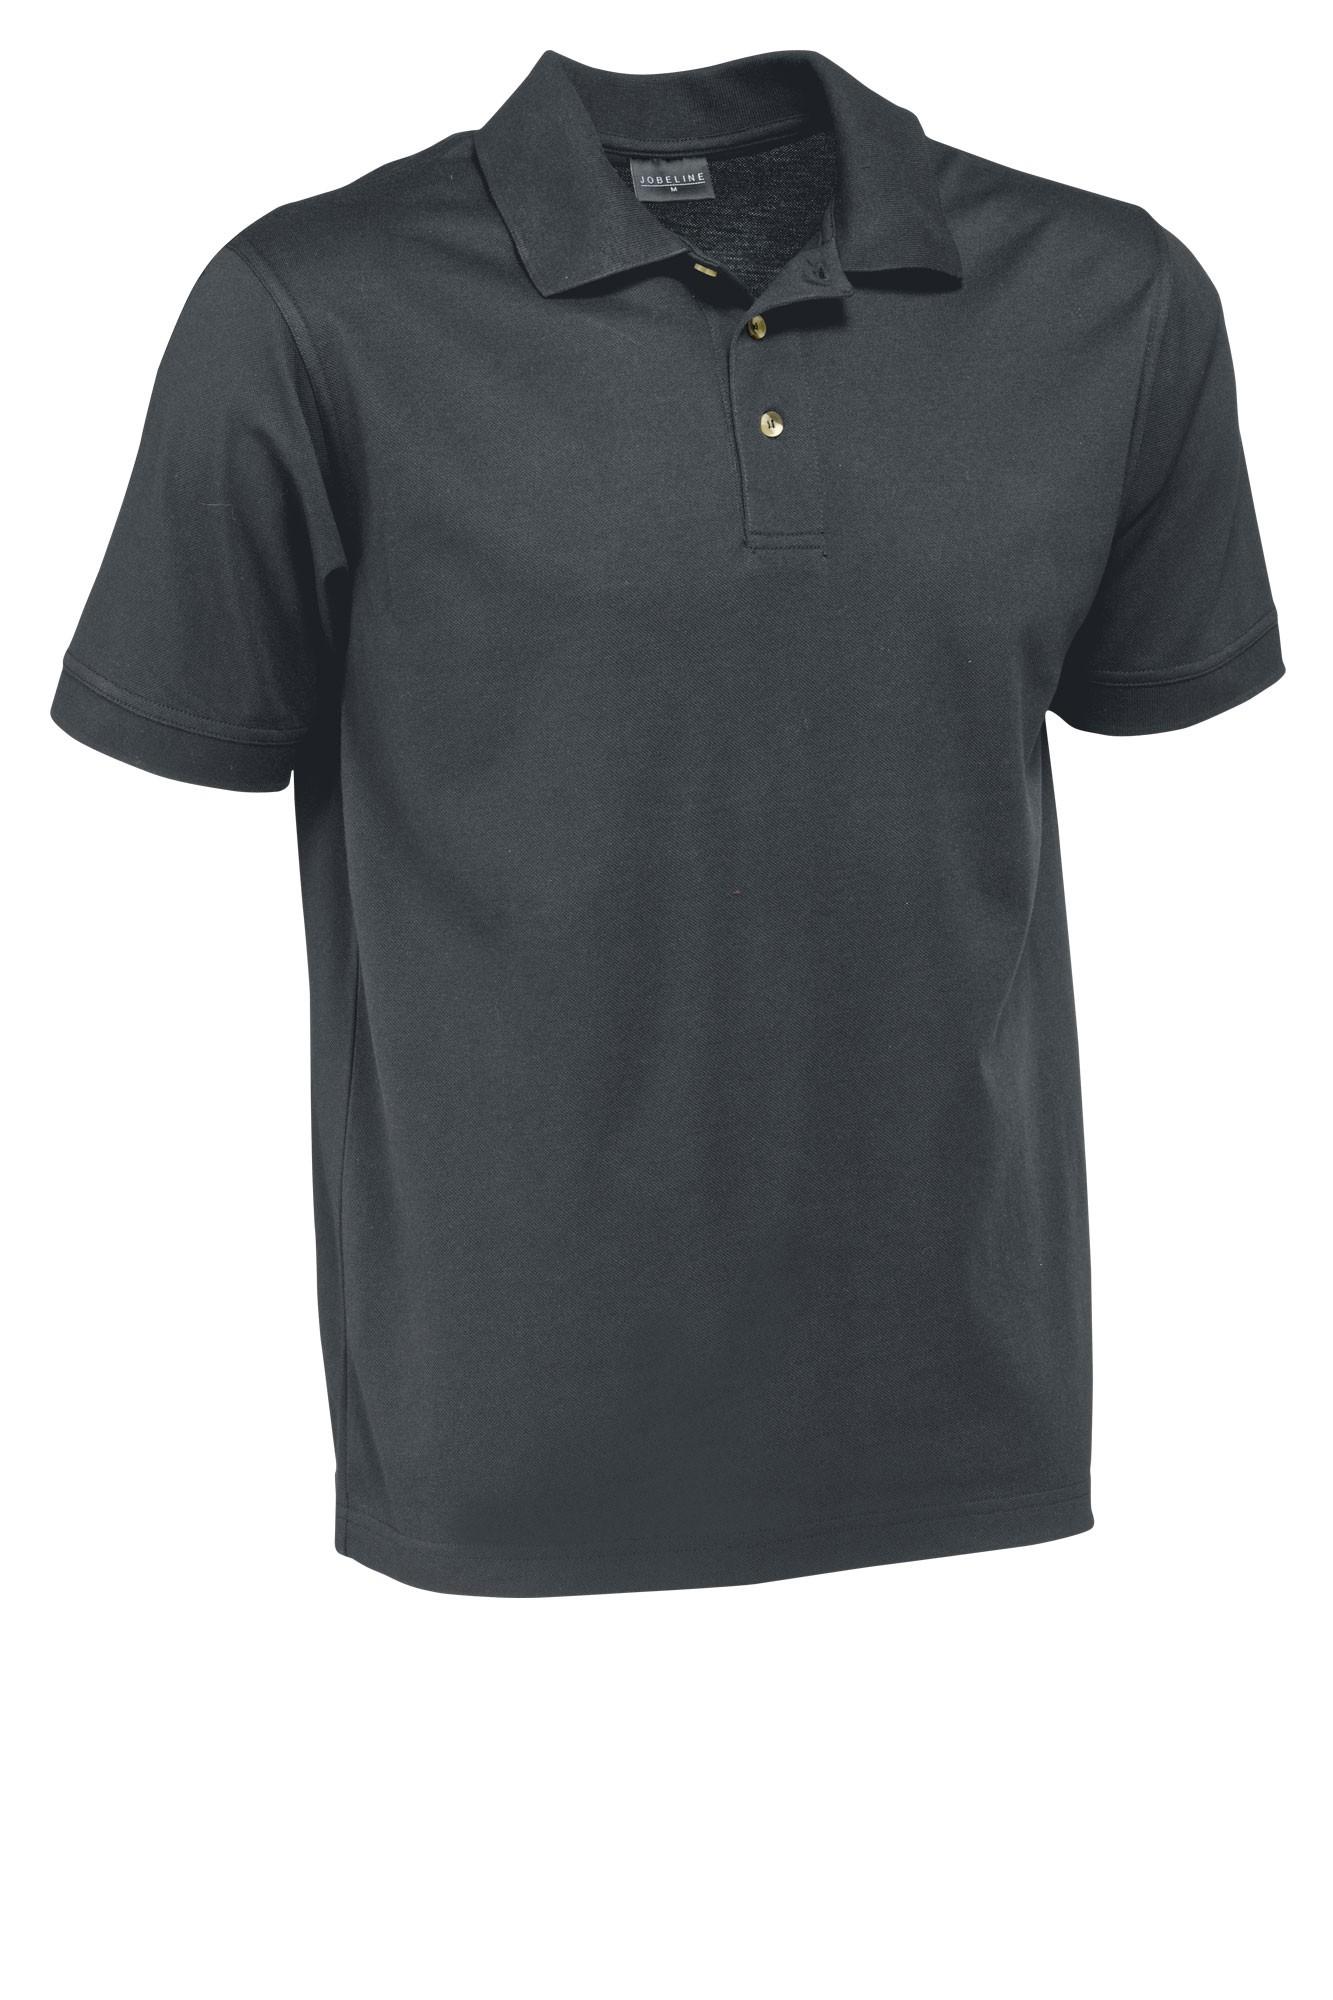 Pánské tričko Fly - šedá